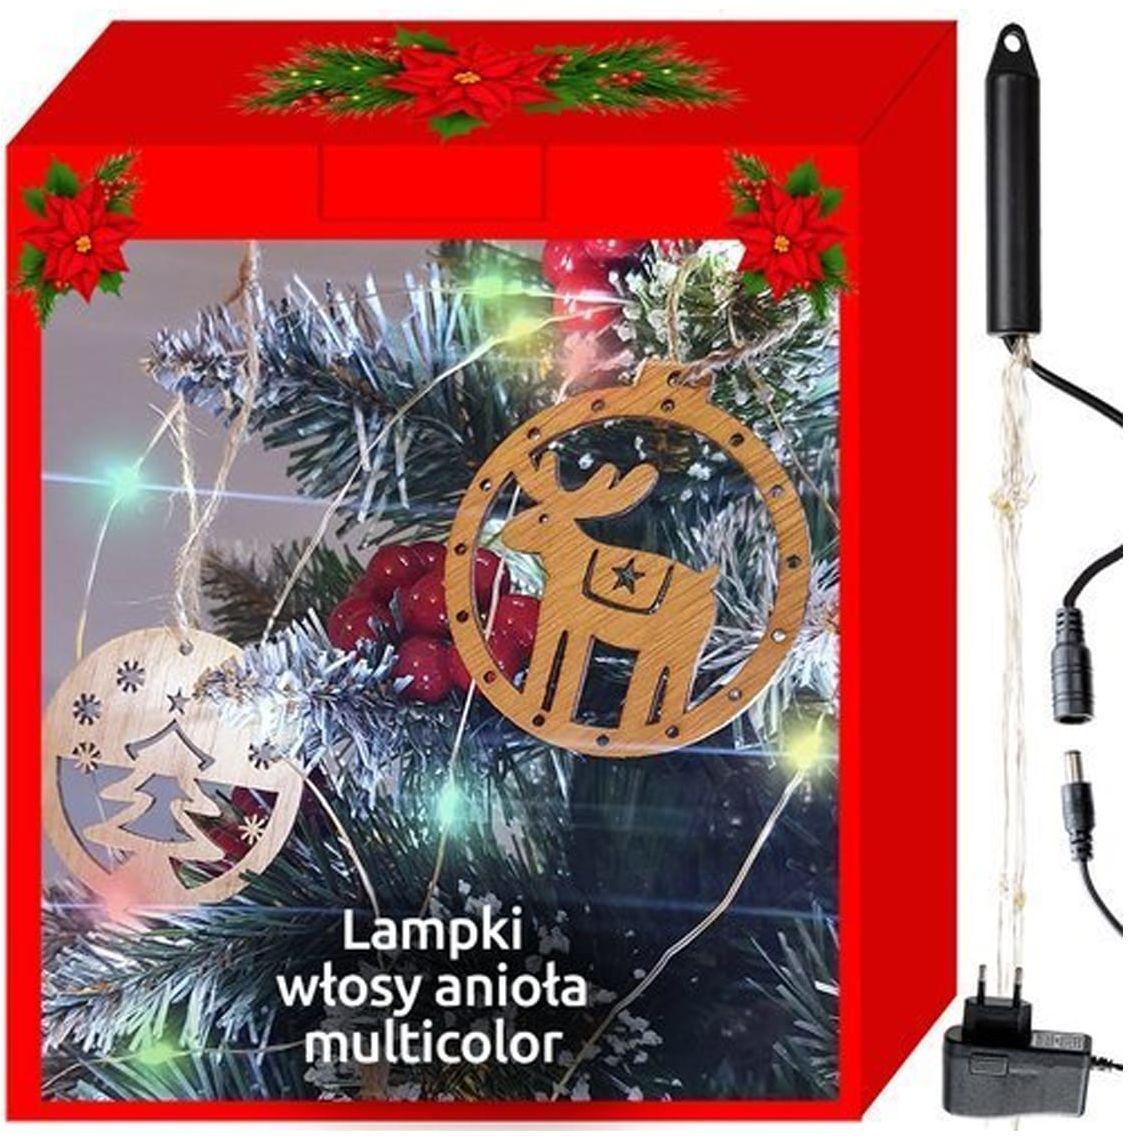 Lampki choinkowe LED włosy anioła - multikolor - 200 lampek